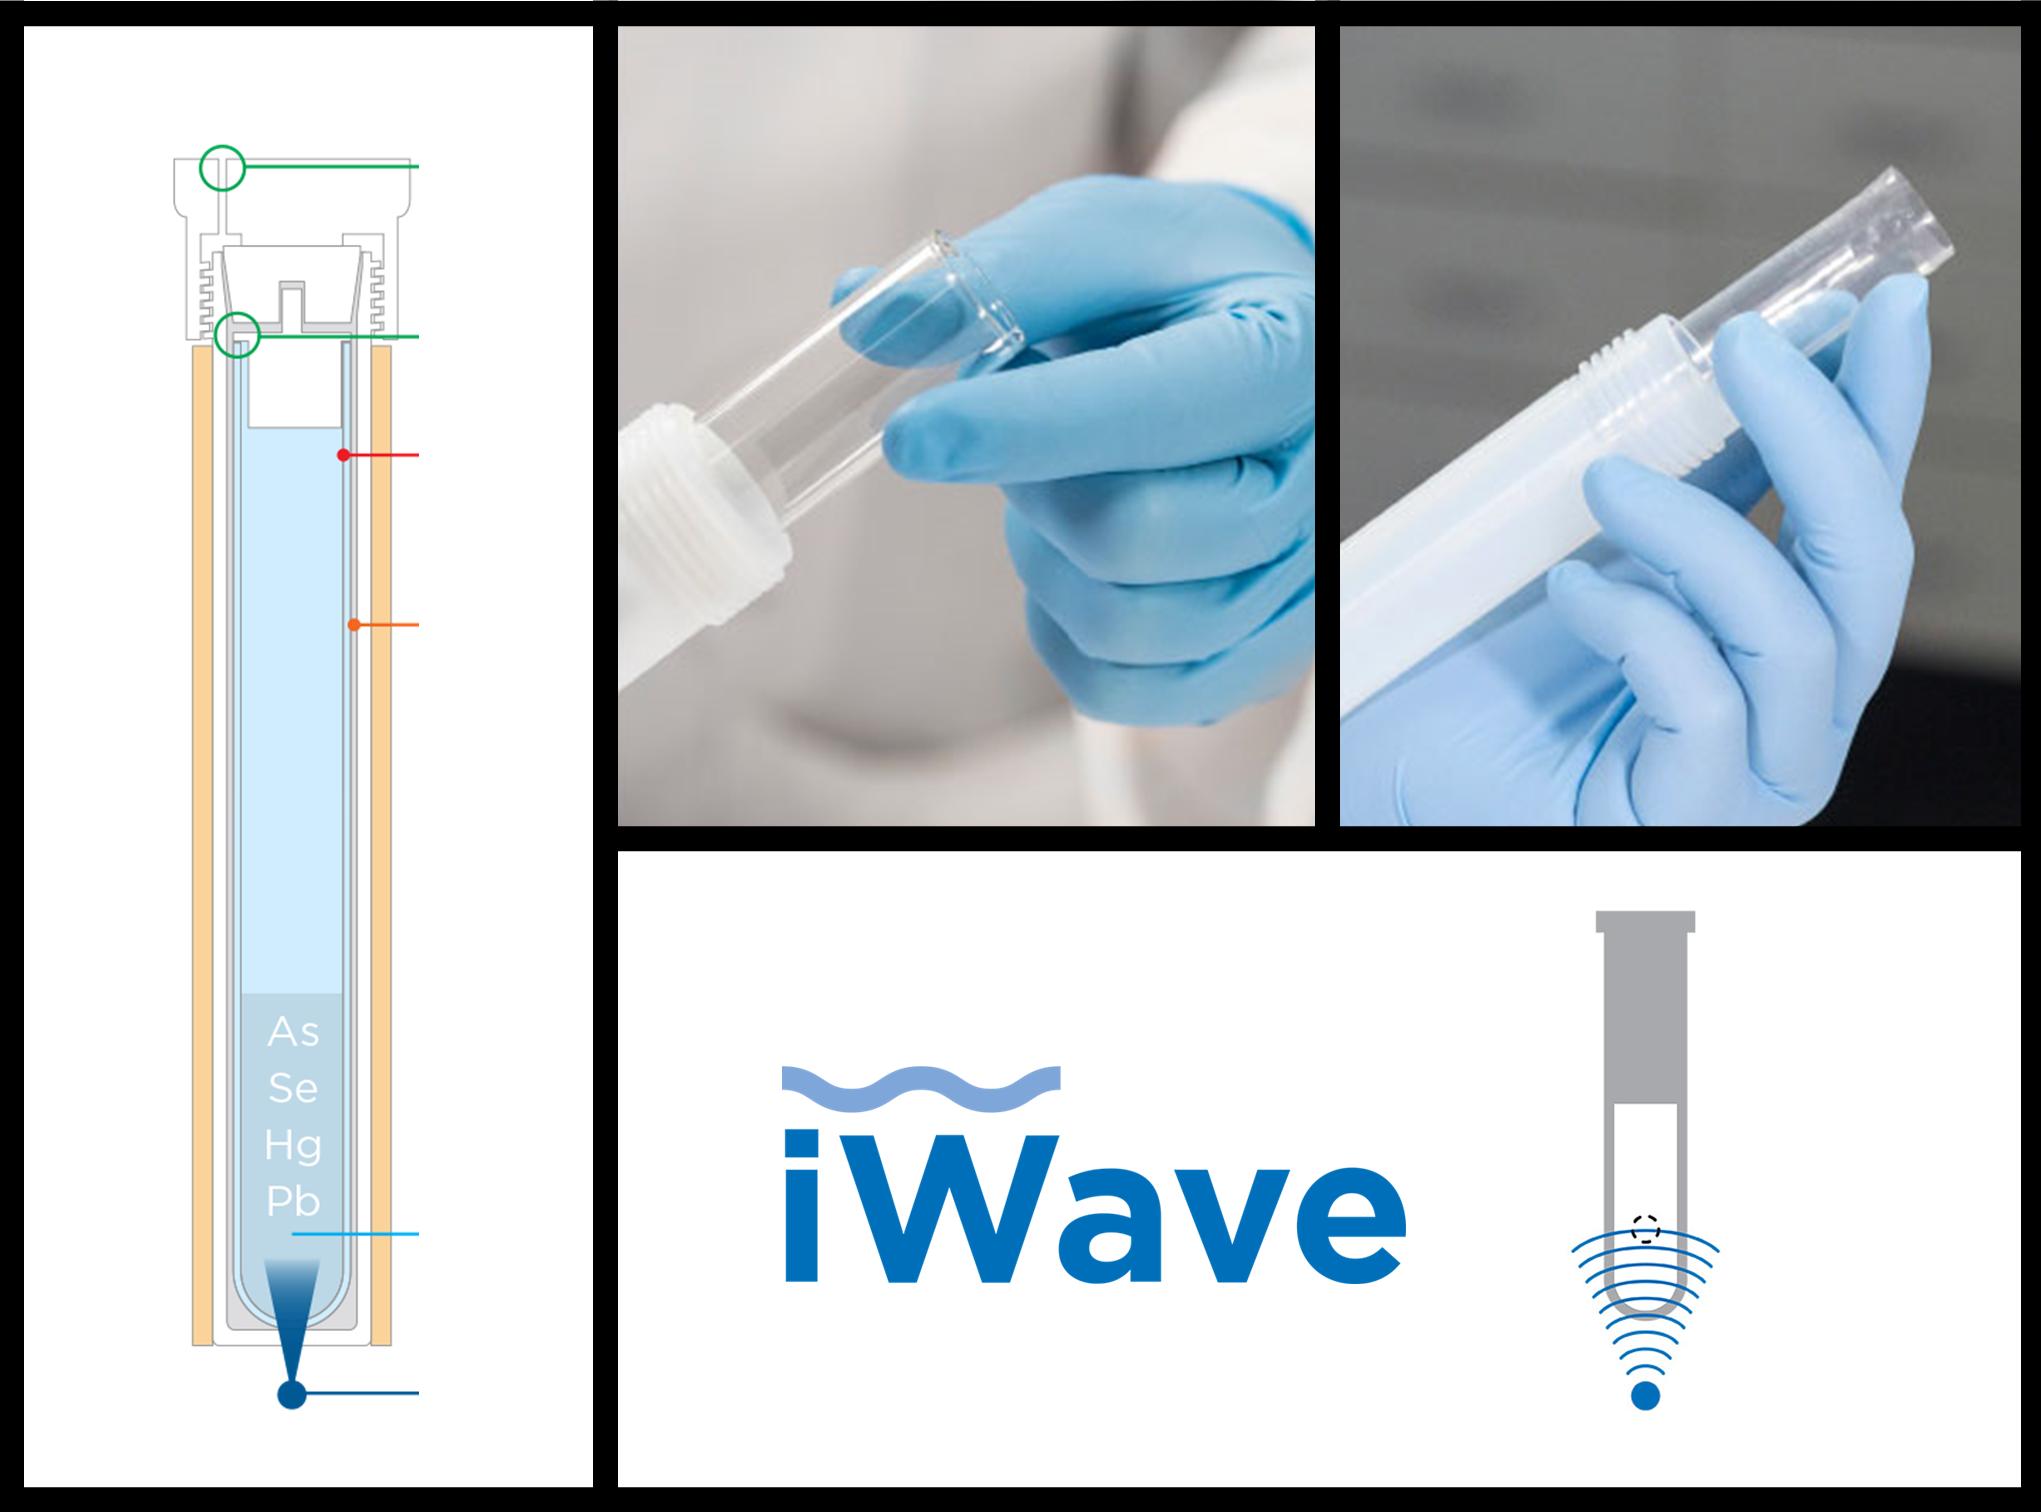 MARS 2 iWave 溫度感測與替換式內襯